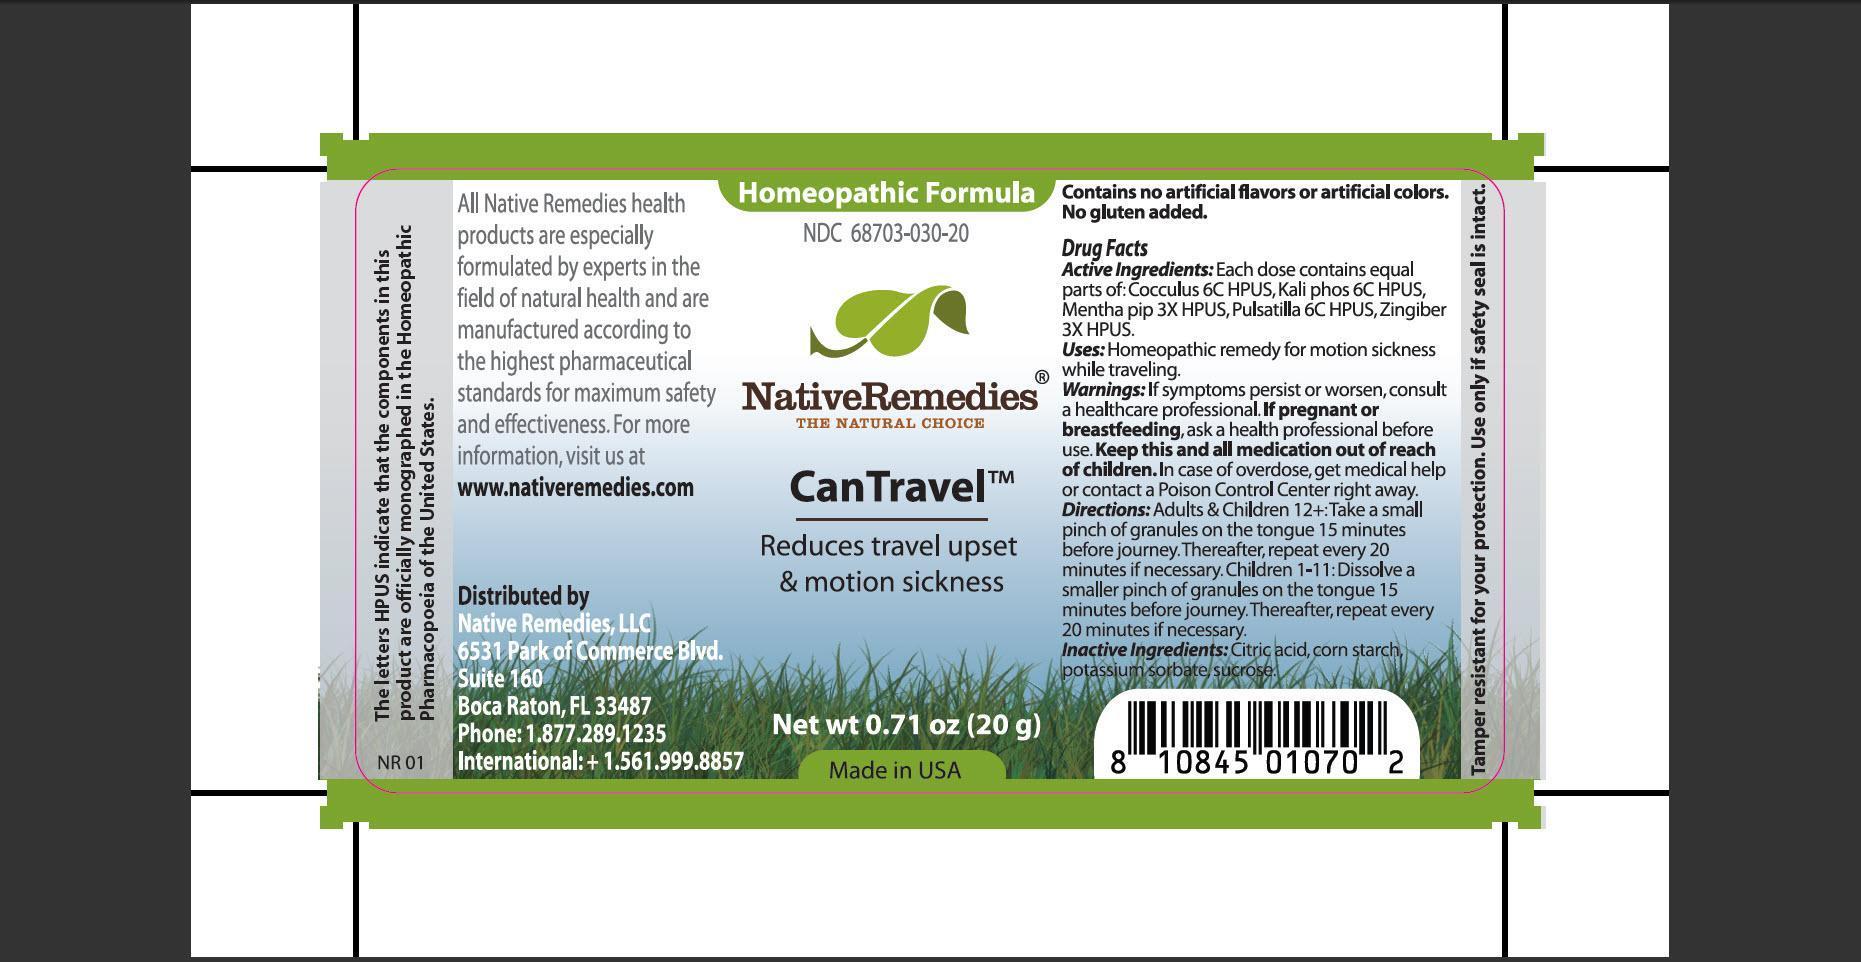 Cantravel (Cocculusm, Kali Phos, Mentha Pip, Pulsatilla, Zingiber) Granule [Native Remedies, Llc]